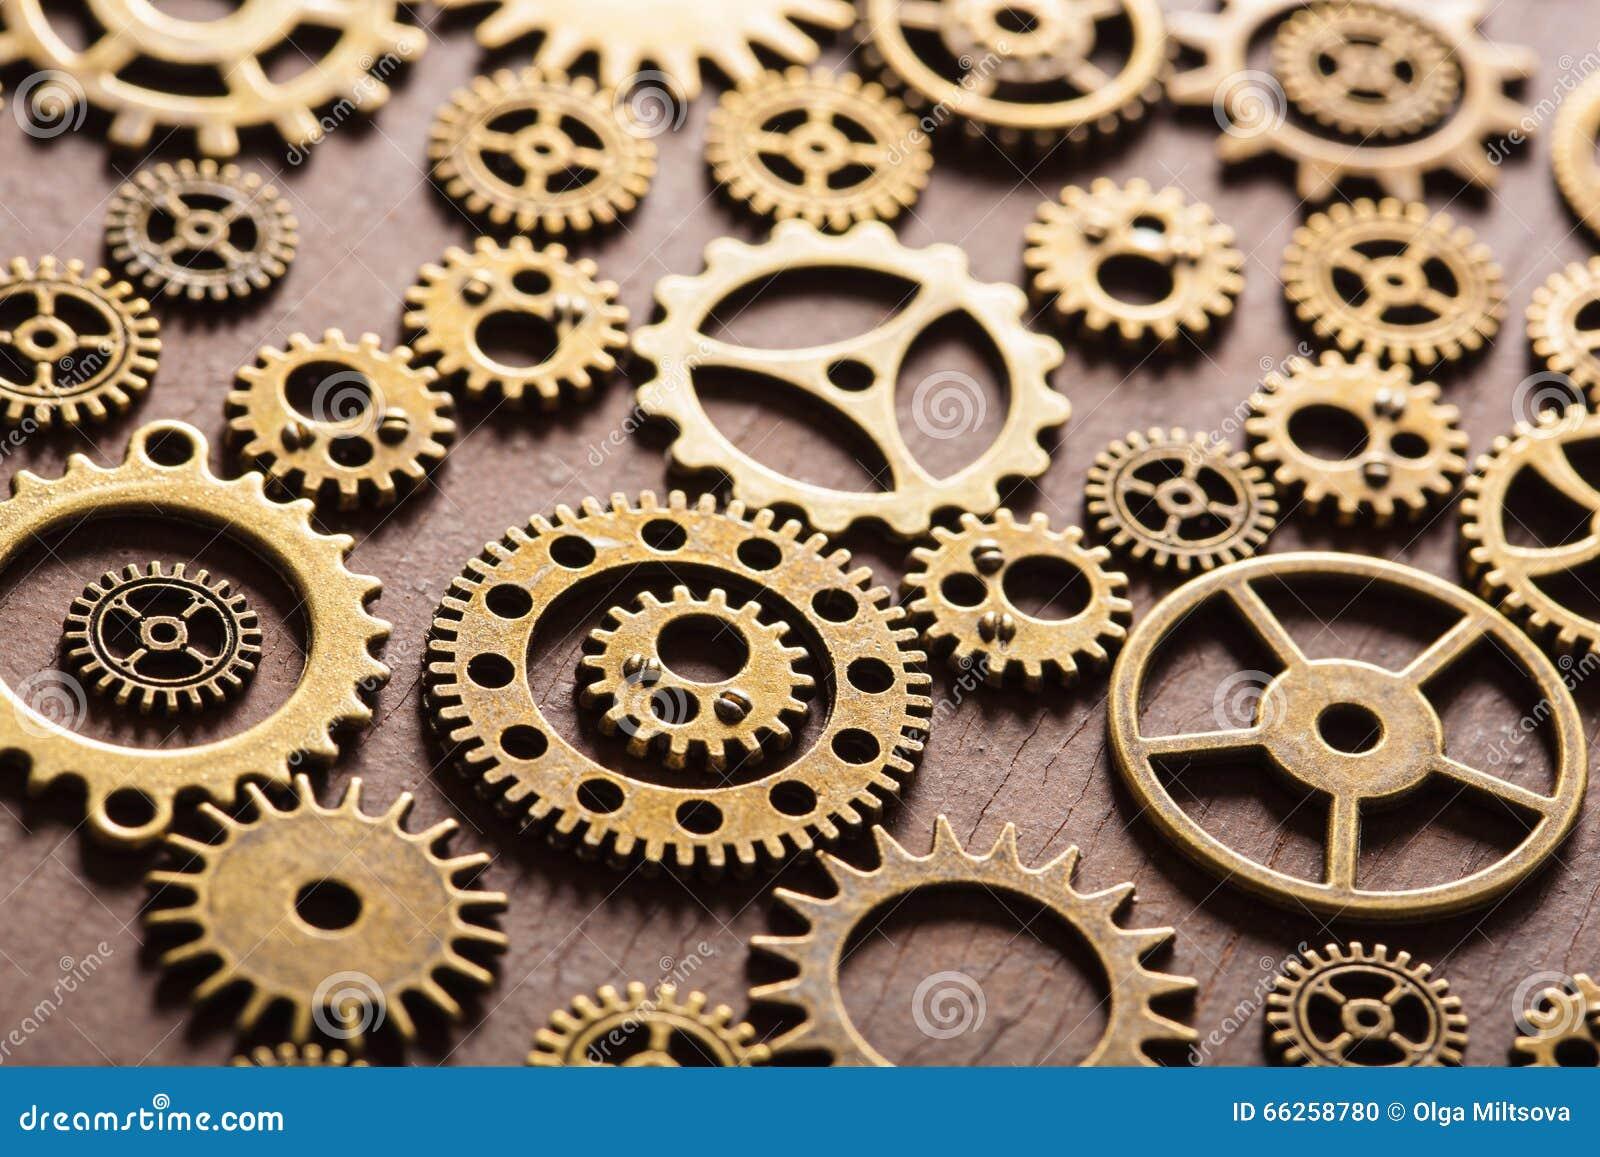 steampunk mechanical cogs gears wheels on wooden background stock